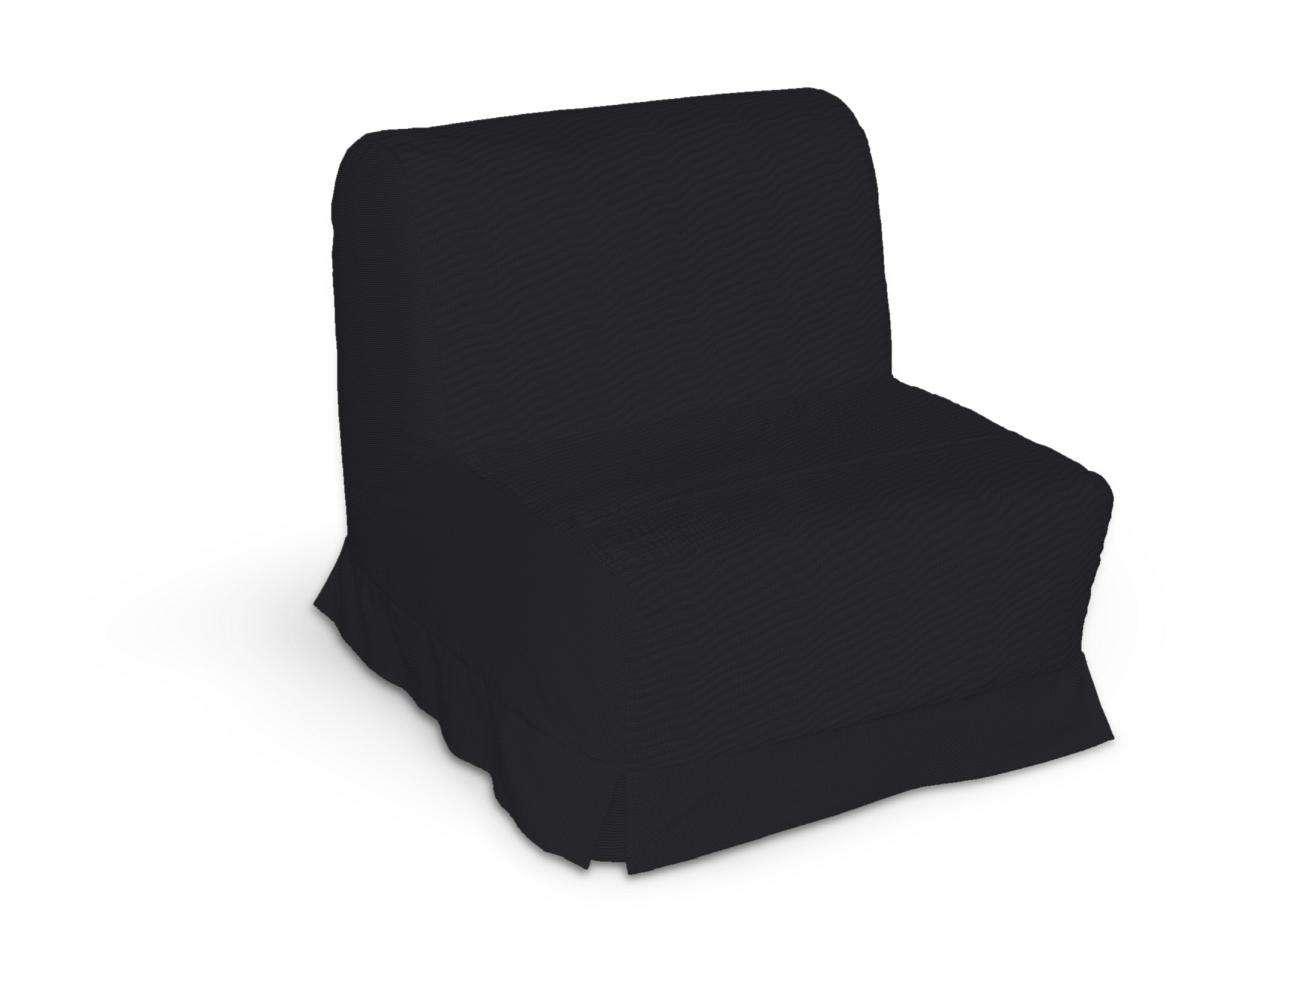 Lycksele Sesselbezug mit Kellerfalten Lycksele von der Kollektion Etna, Stoff: 705-00